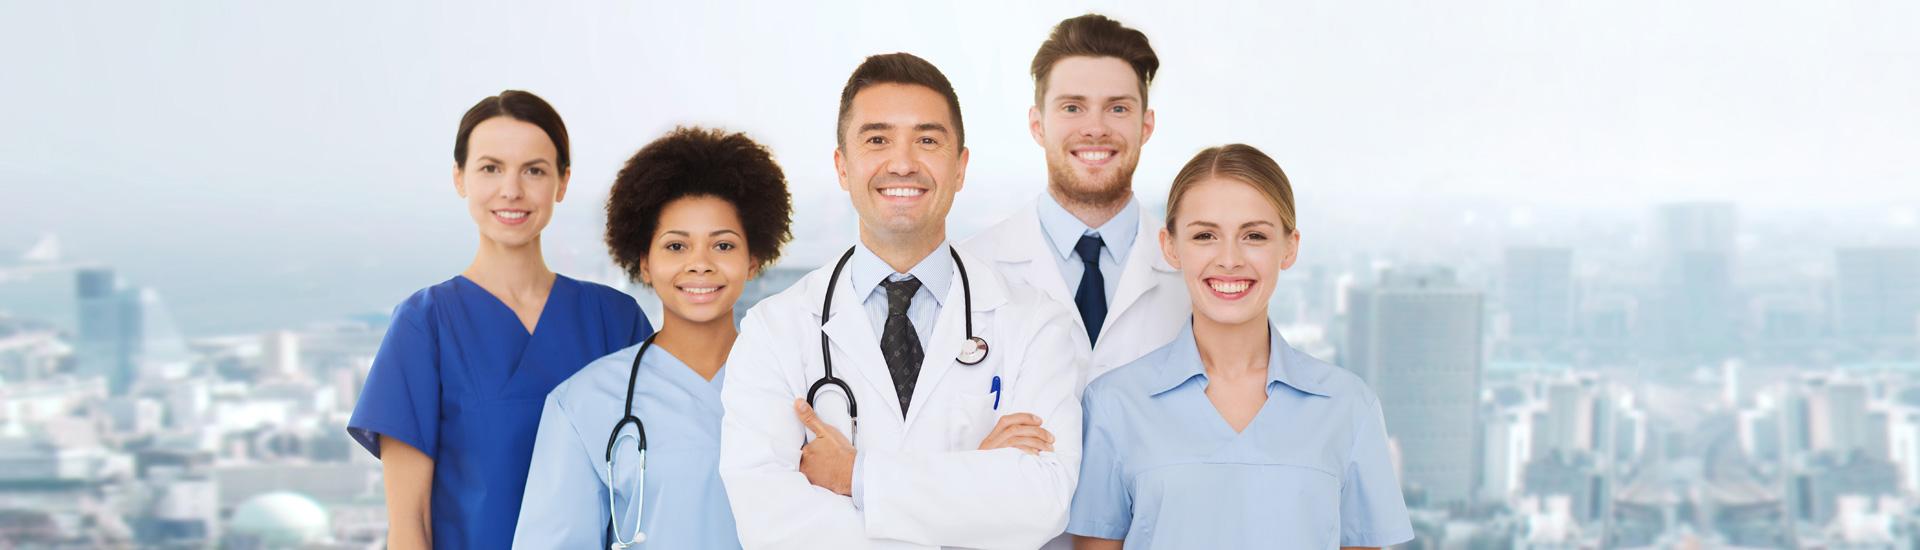 psw and nursing agency  psw's job form